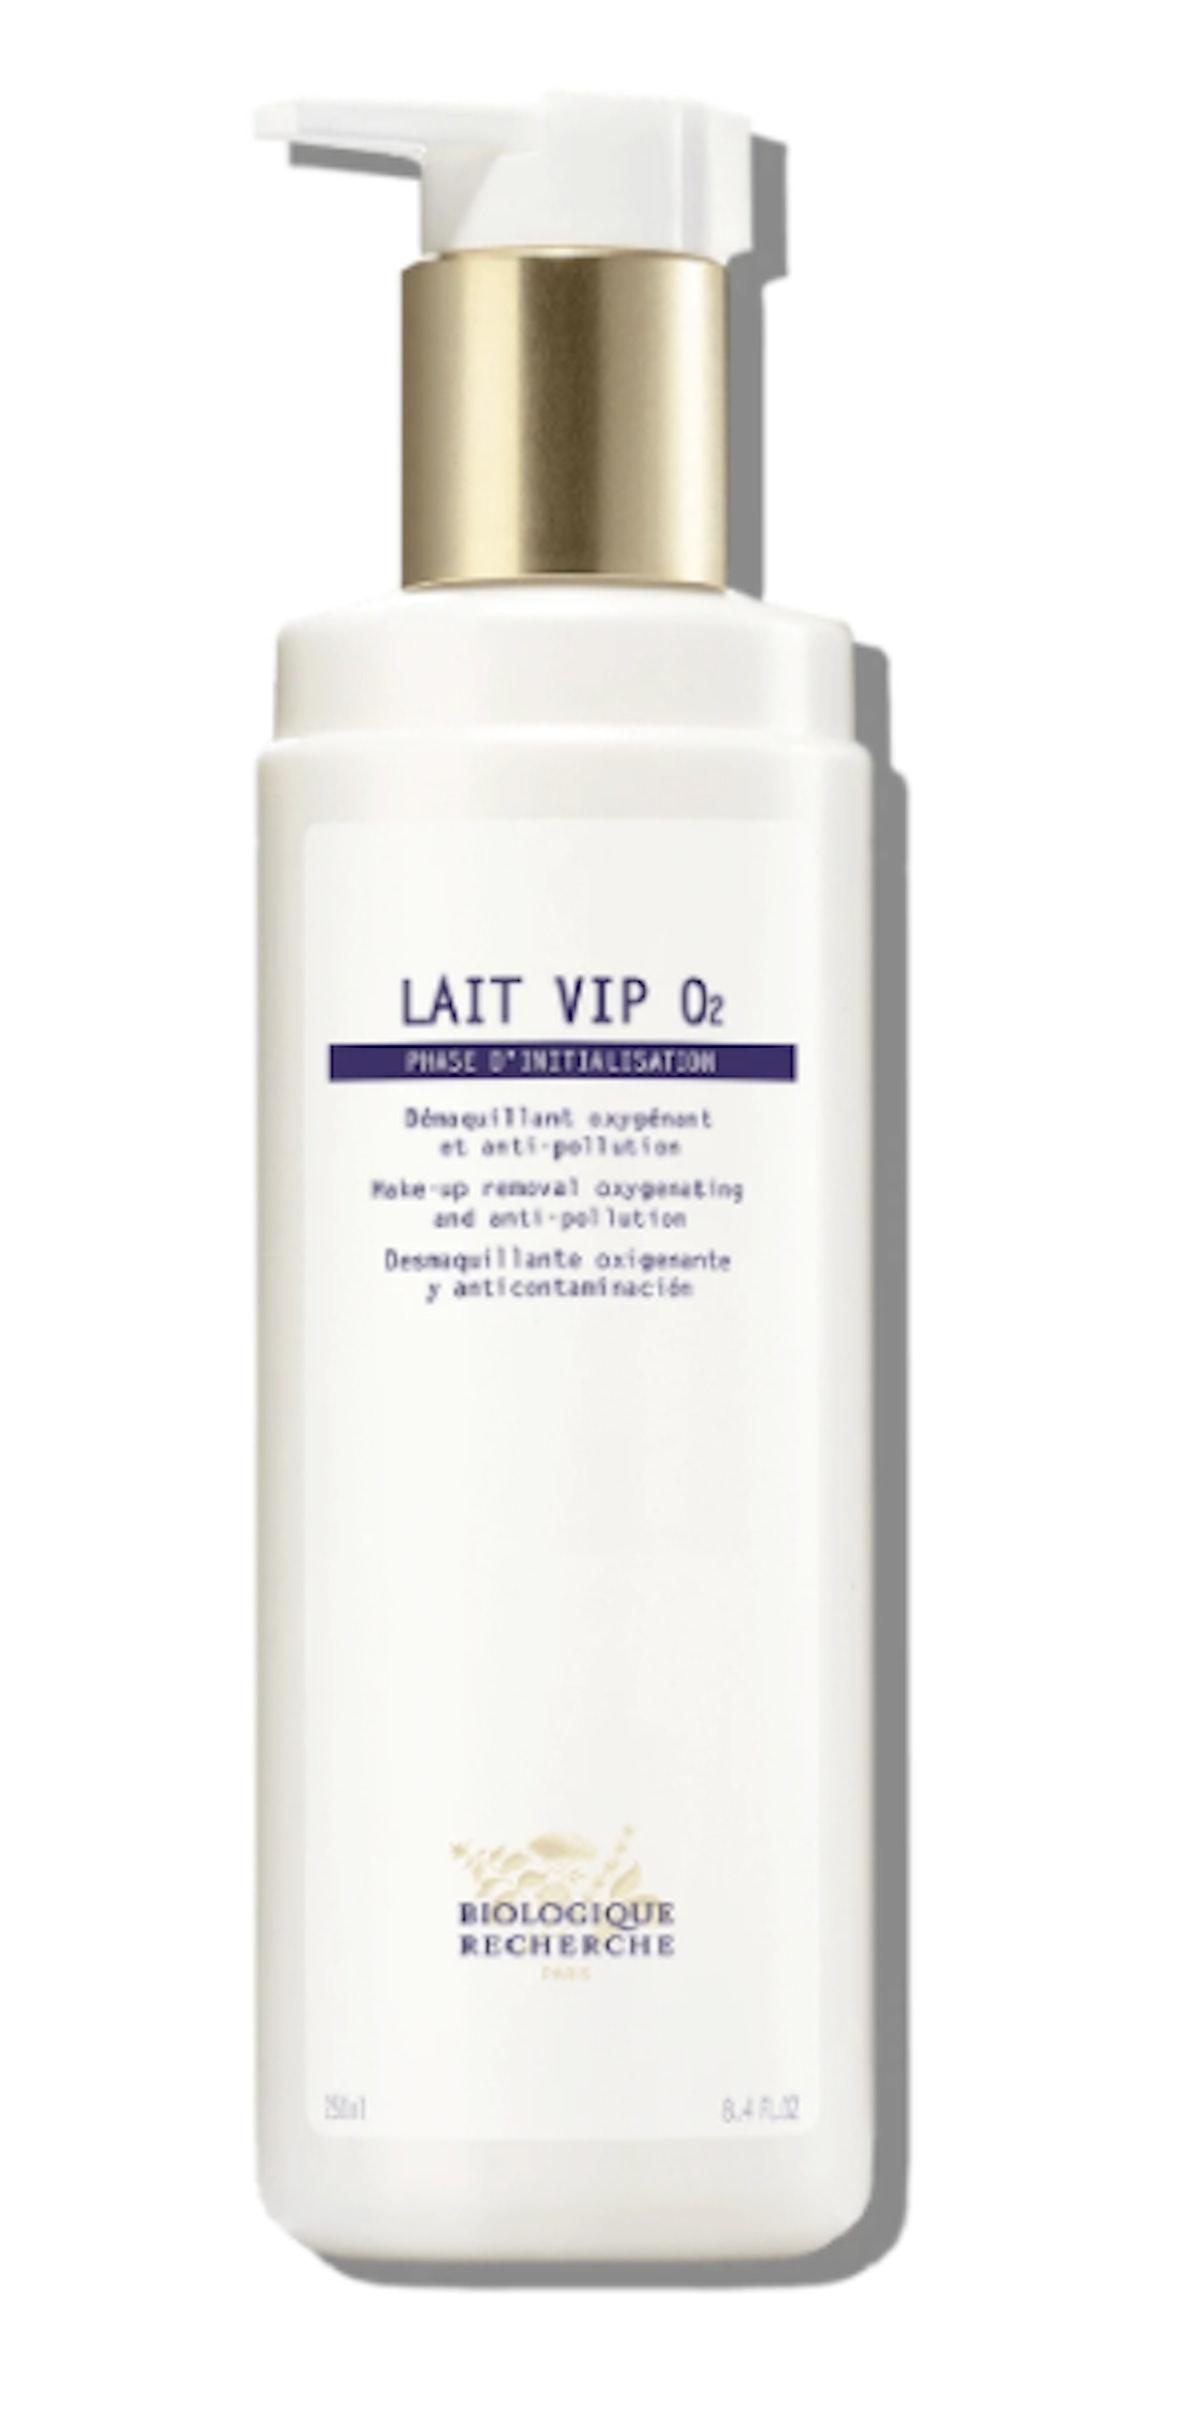 LAIT VIP O2 OXYGENATING MILK CLEANSER